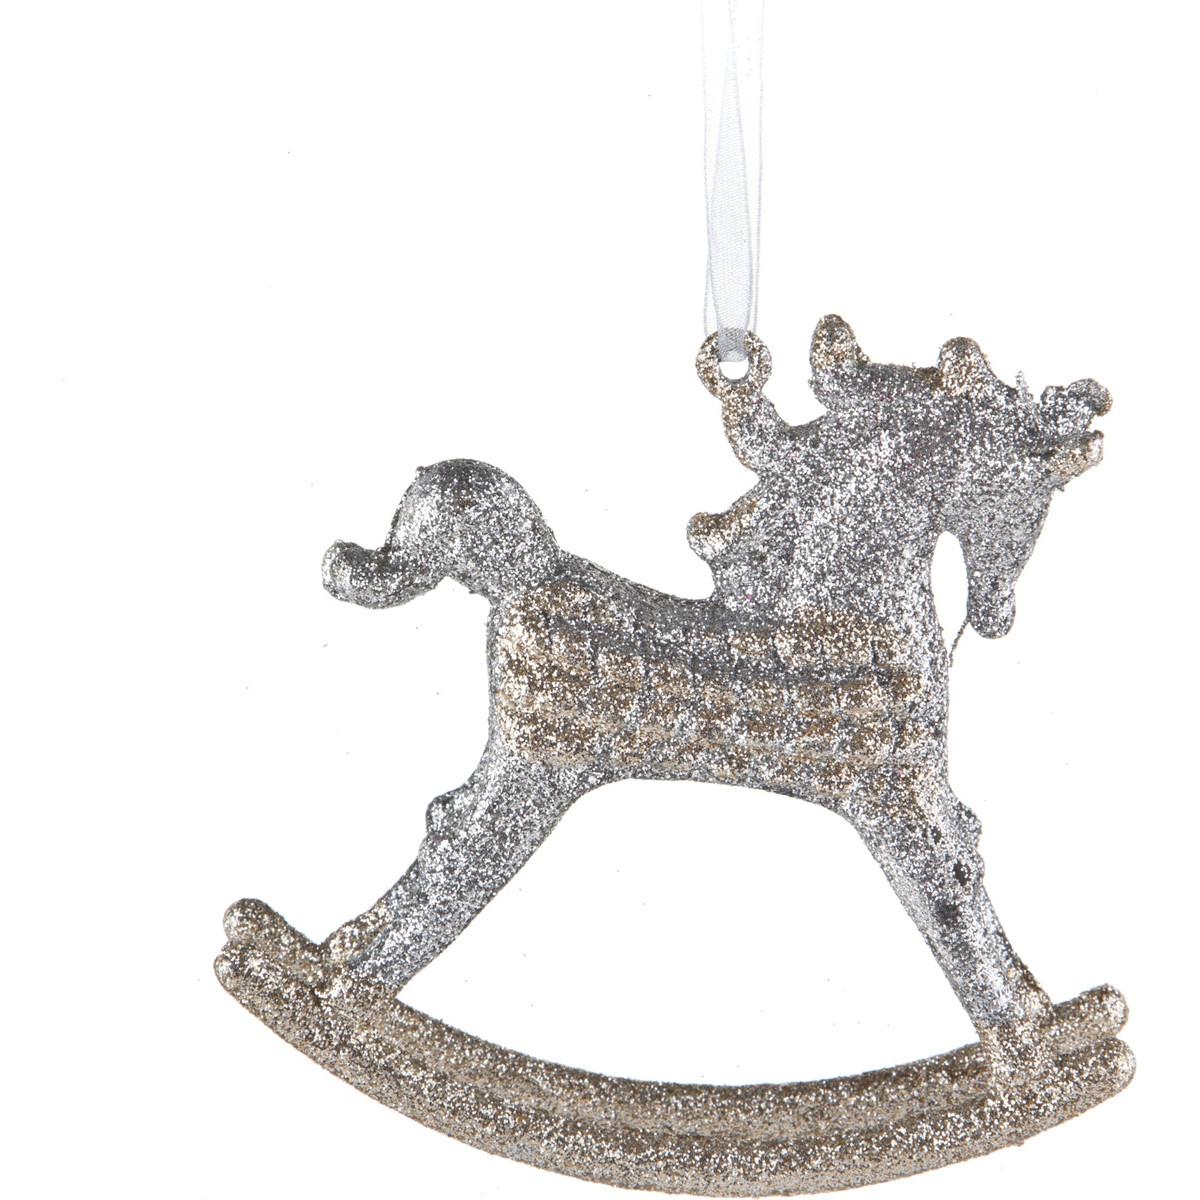 {} Arti-M Сувенир Rebeca  (10х10 см) high quality new 3d model for cnc 3d carved figure sculpture machine in stl file book